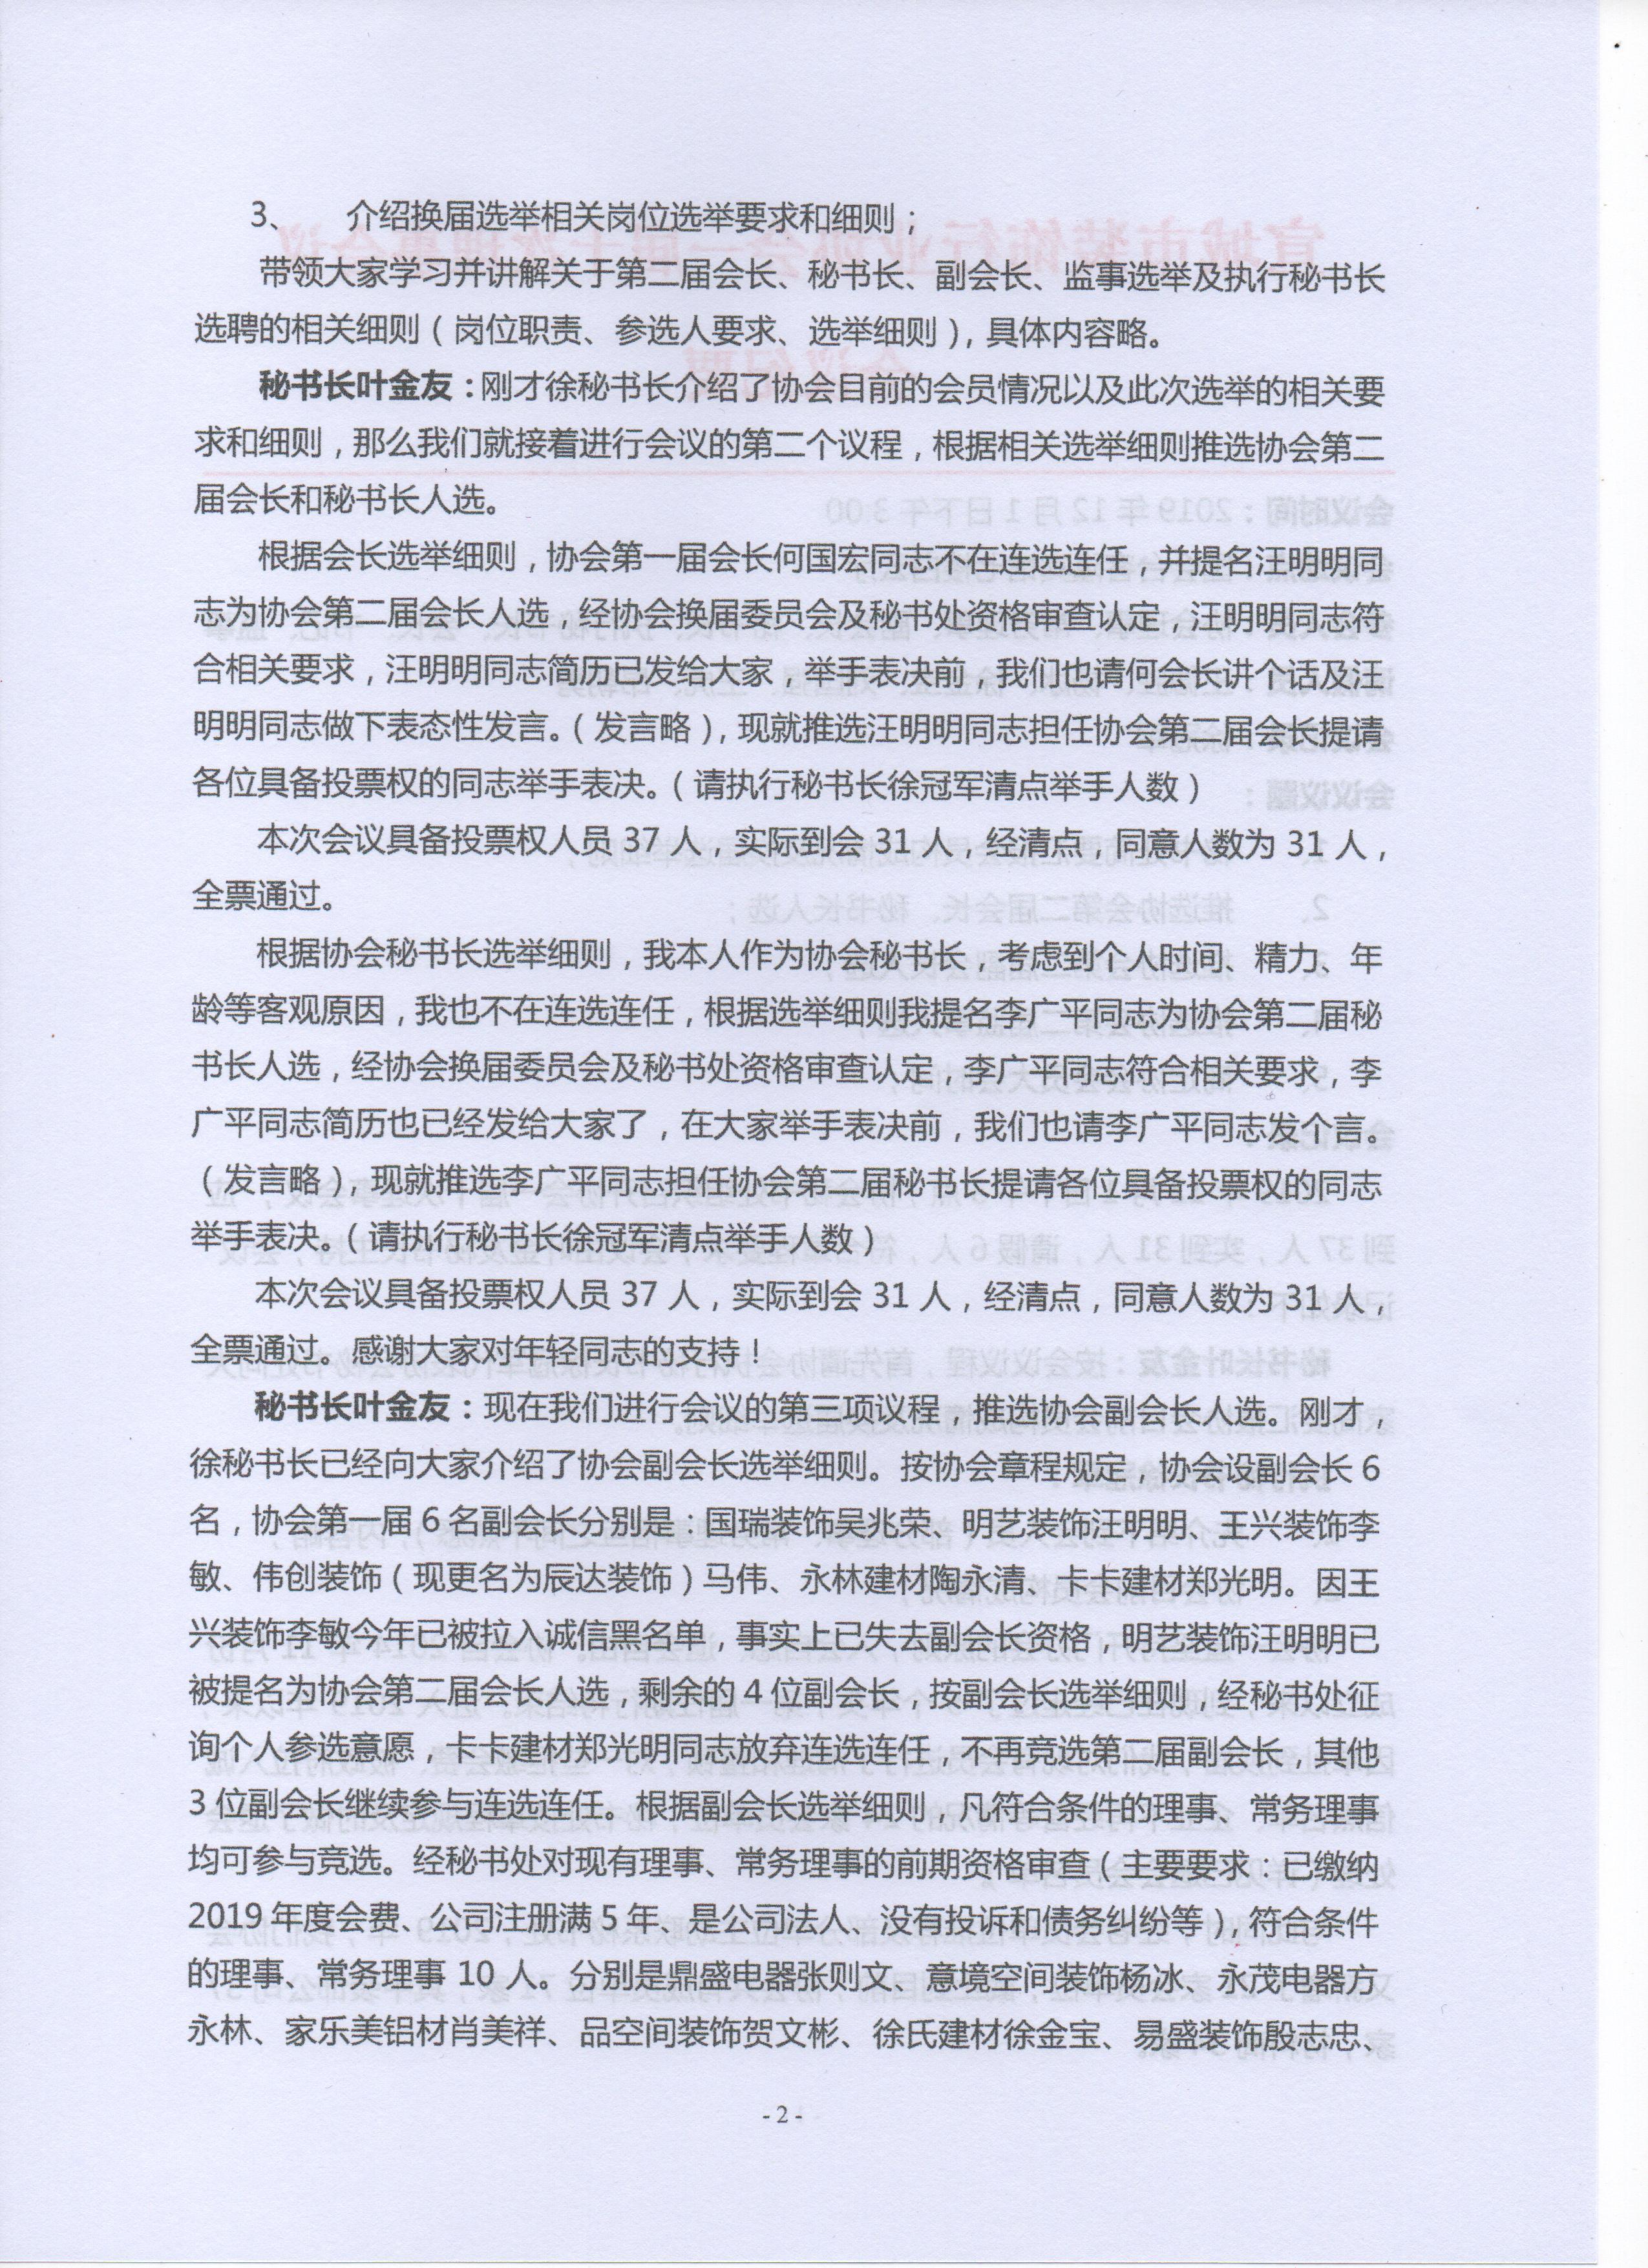 beplay亚洲官网beplay注册行业协会一届十次理事会议会议纪要2